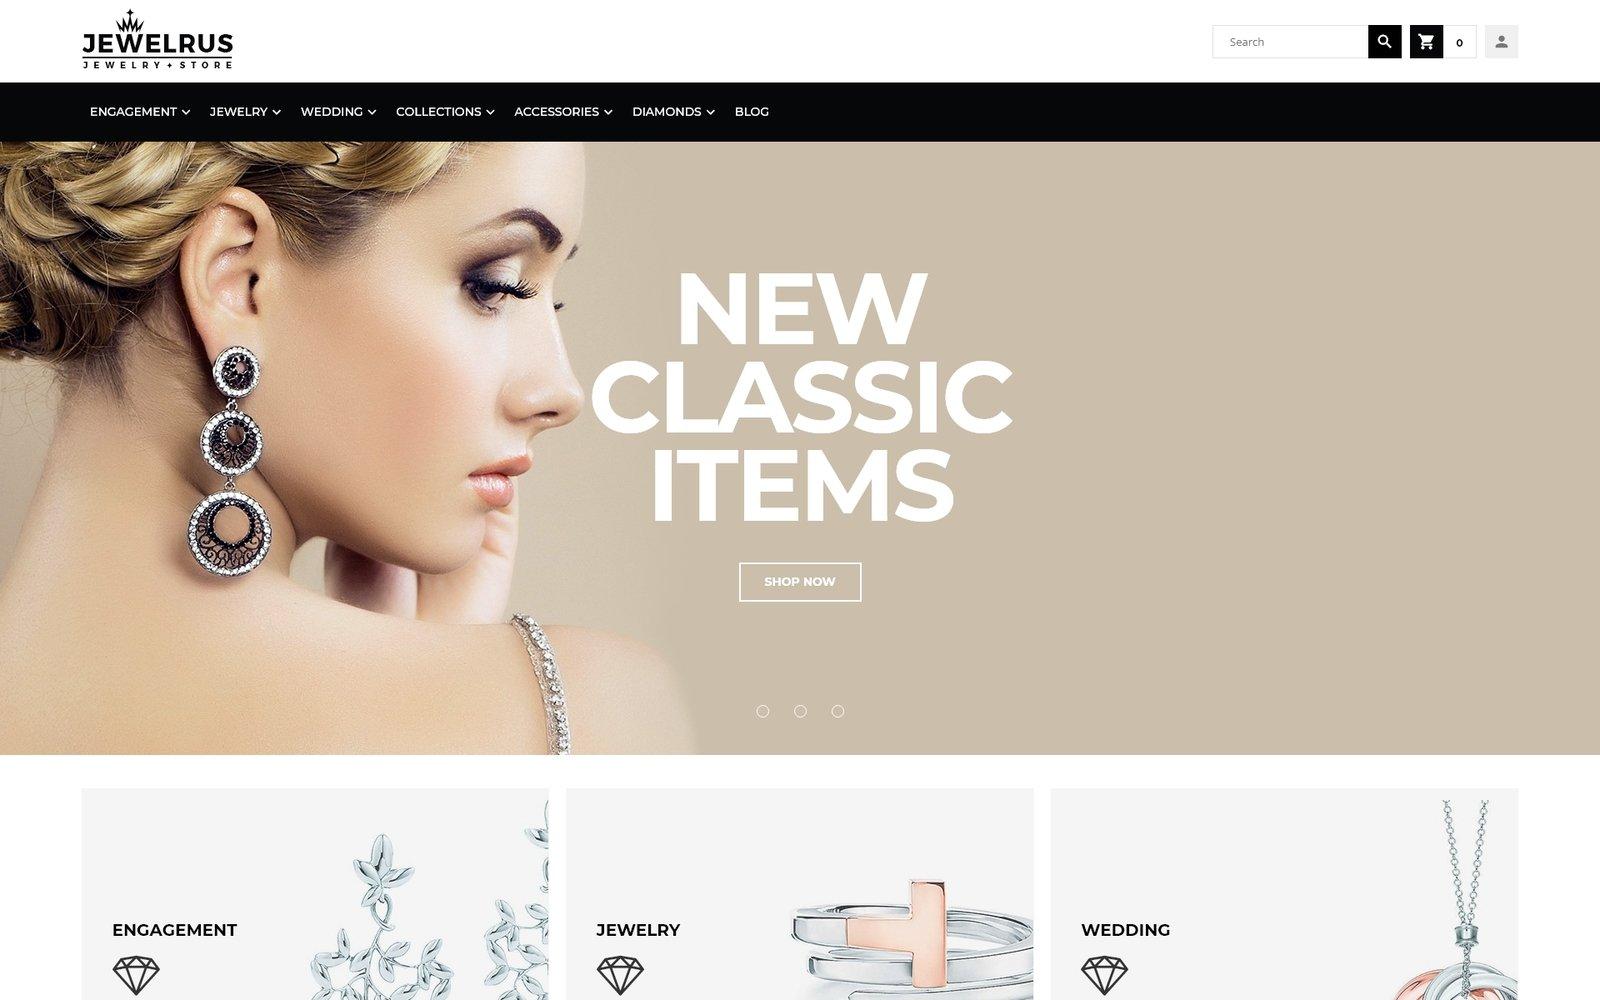 """Jewelrus - Jewelry Store"" Responsive Magento Thema №66100"